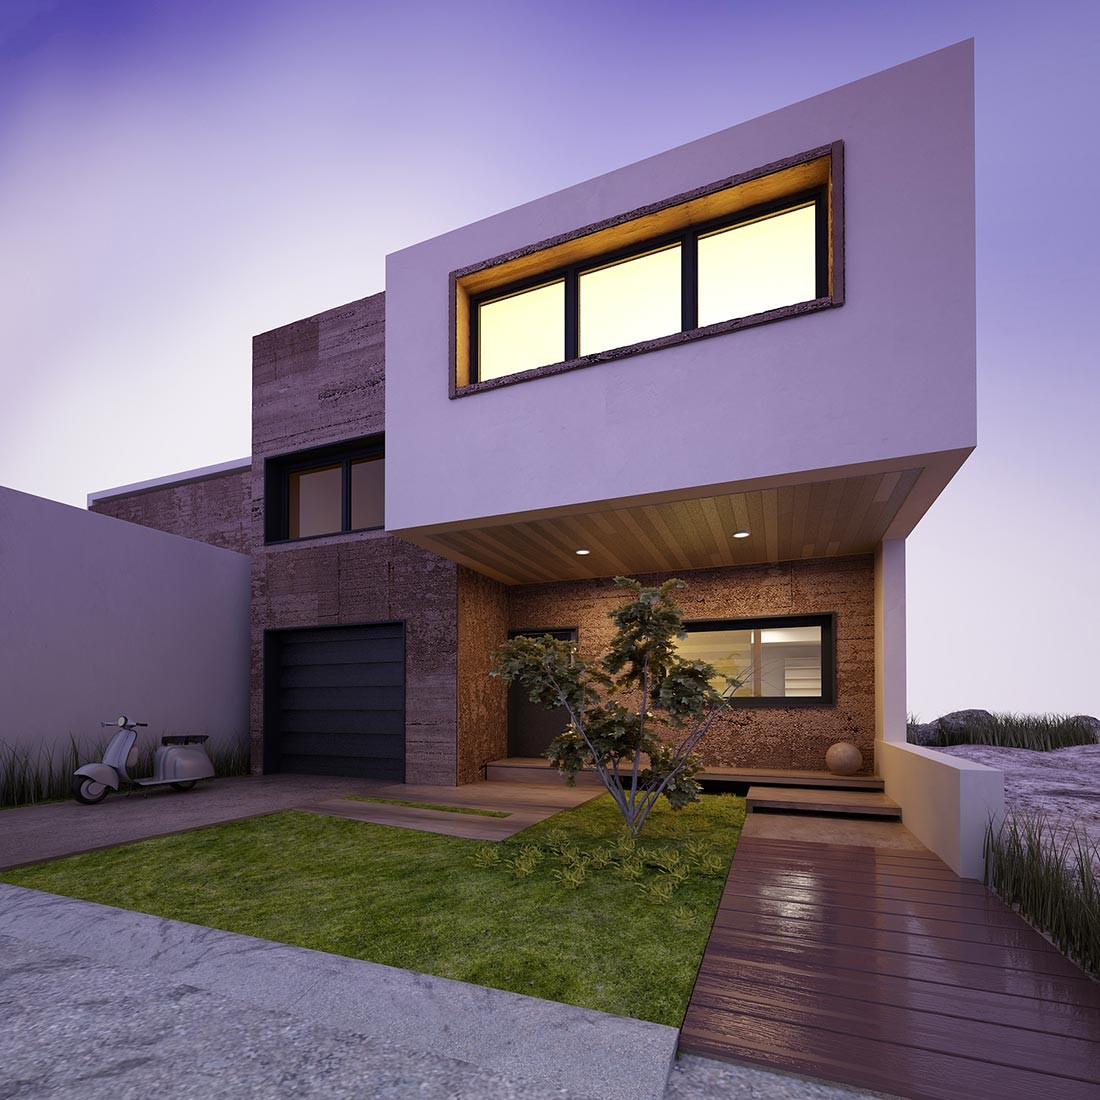 Arquitectura moderna e interiores por Avantia